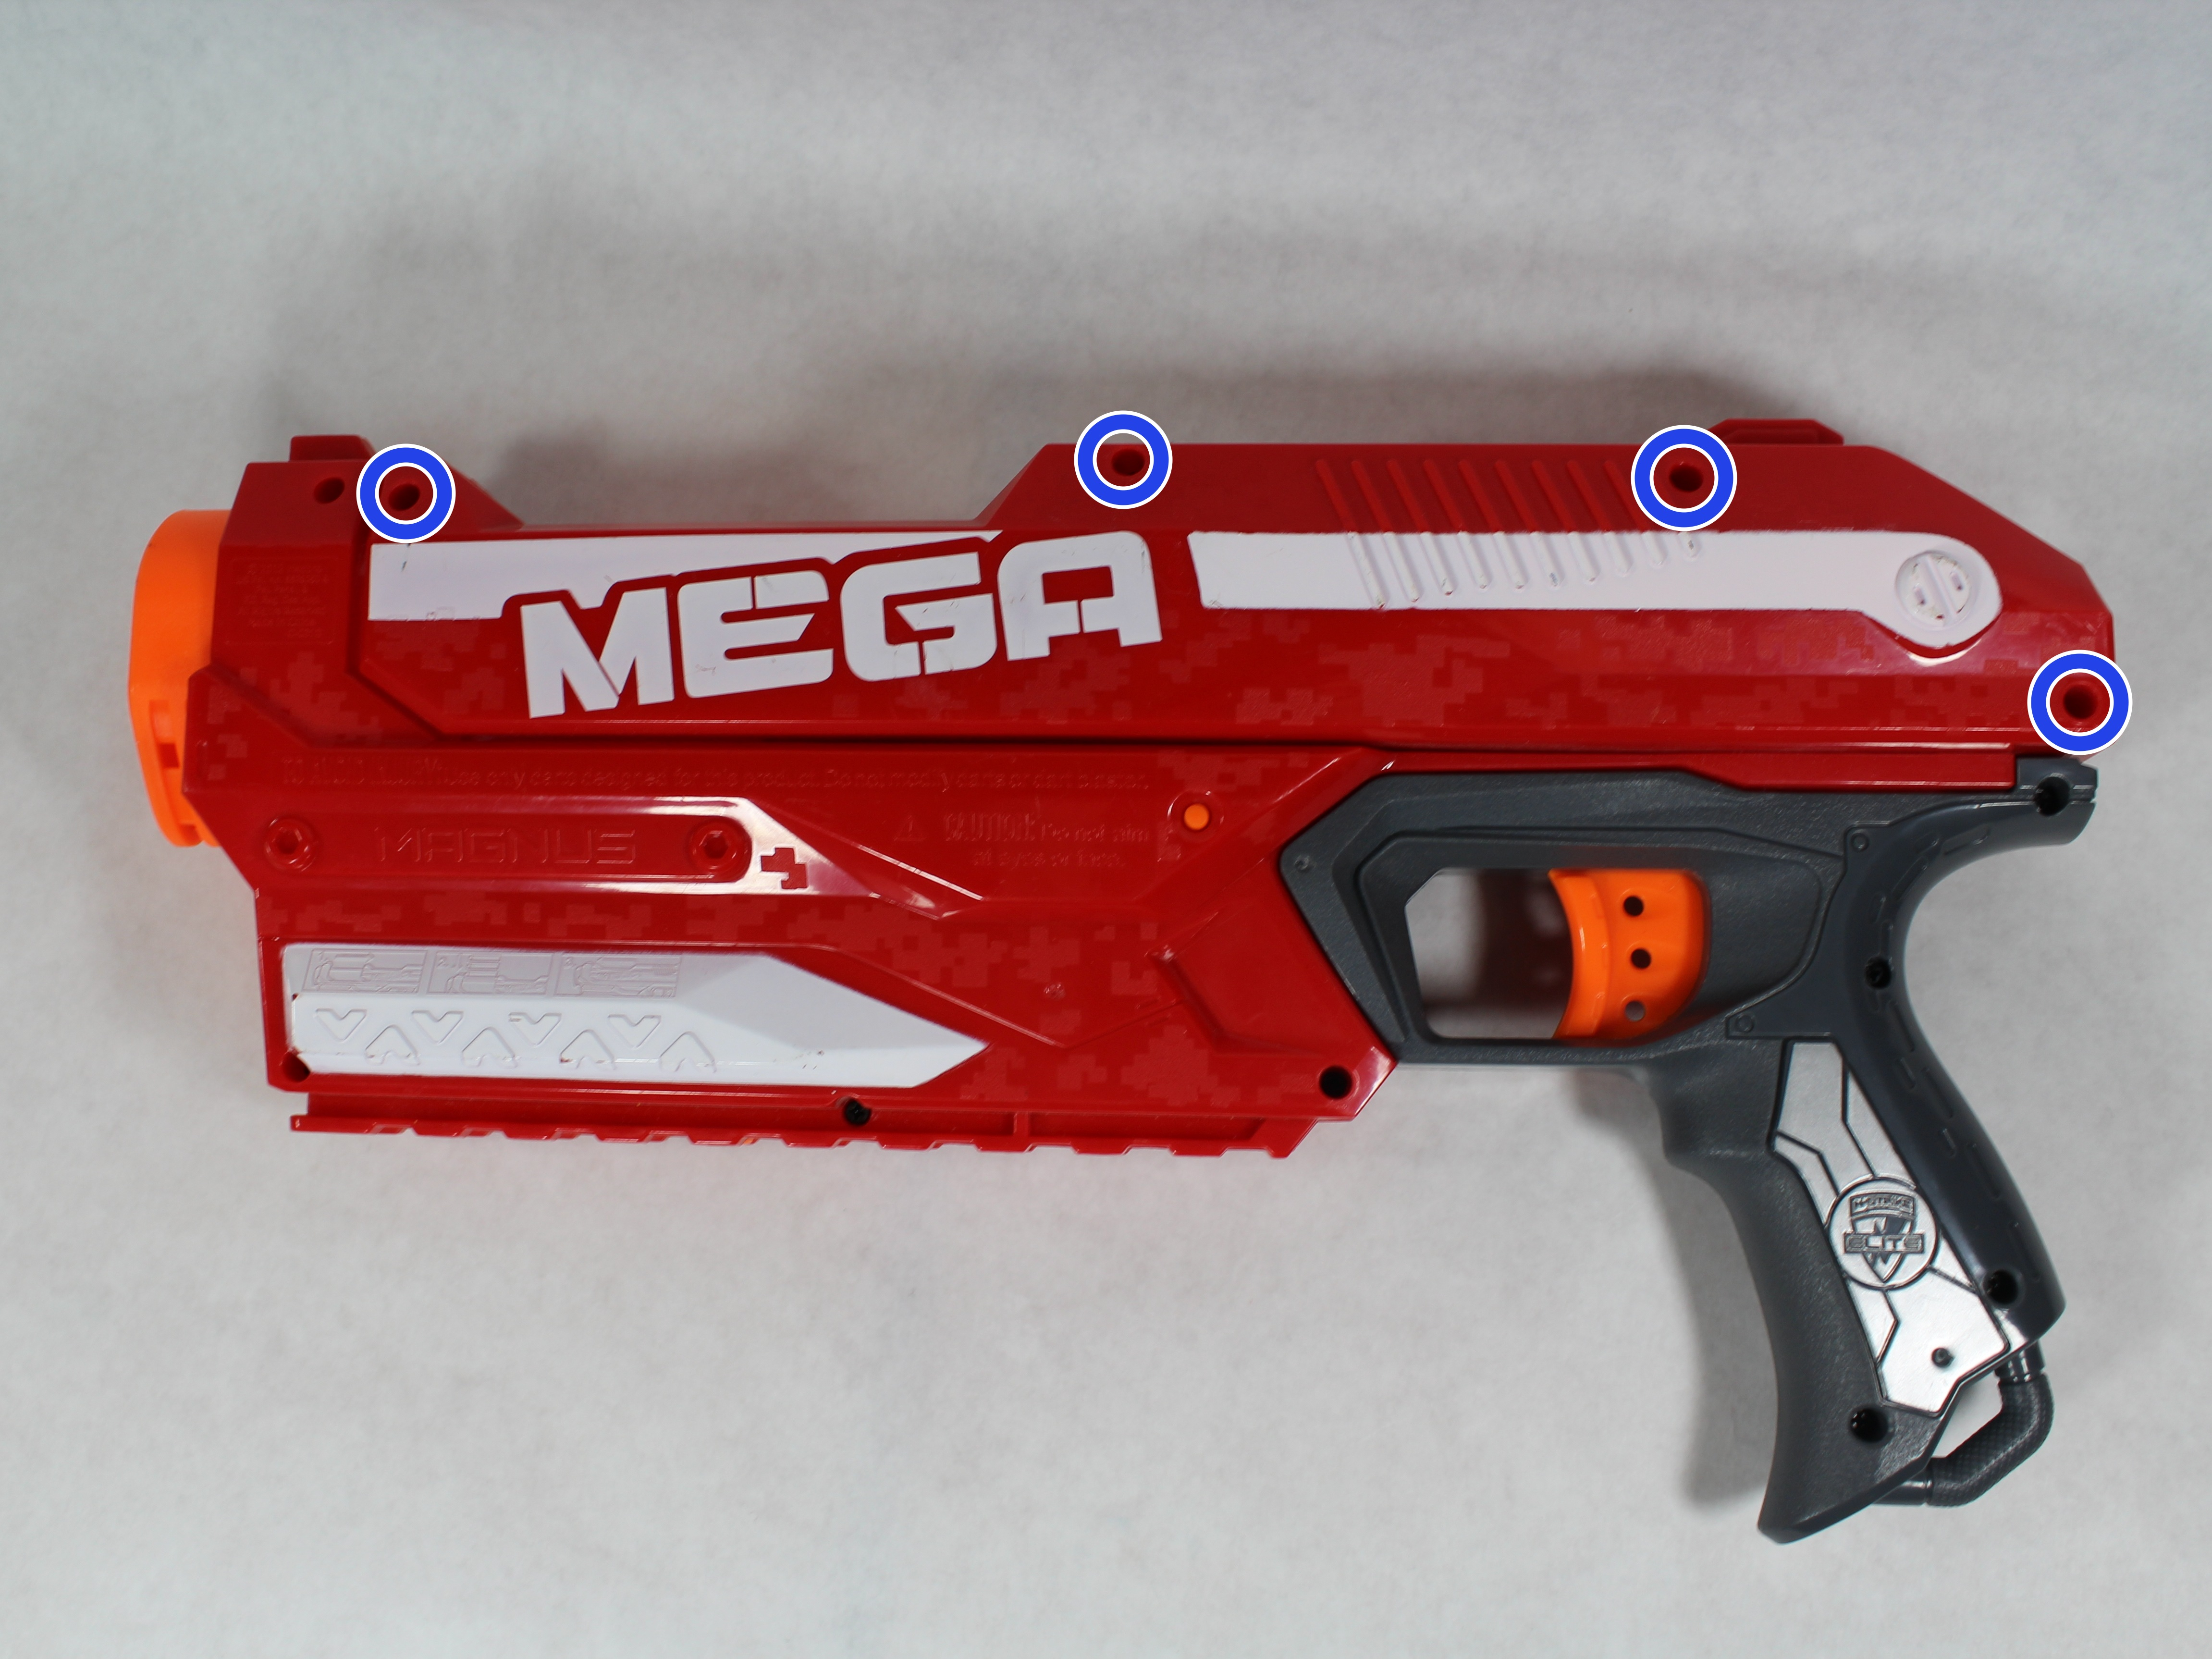 03ed20181e8 Nerf N-Strike Elite Mega Magnus Repair - iFixit